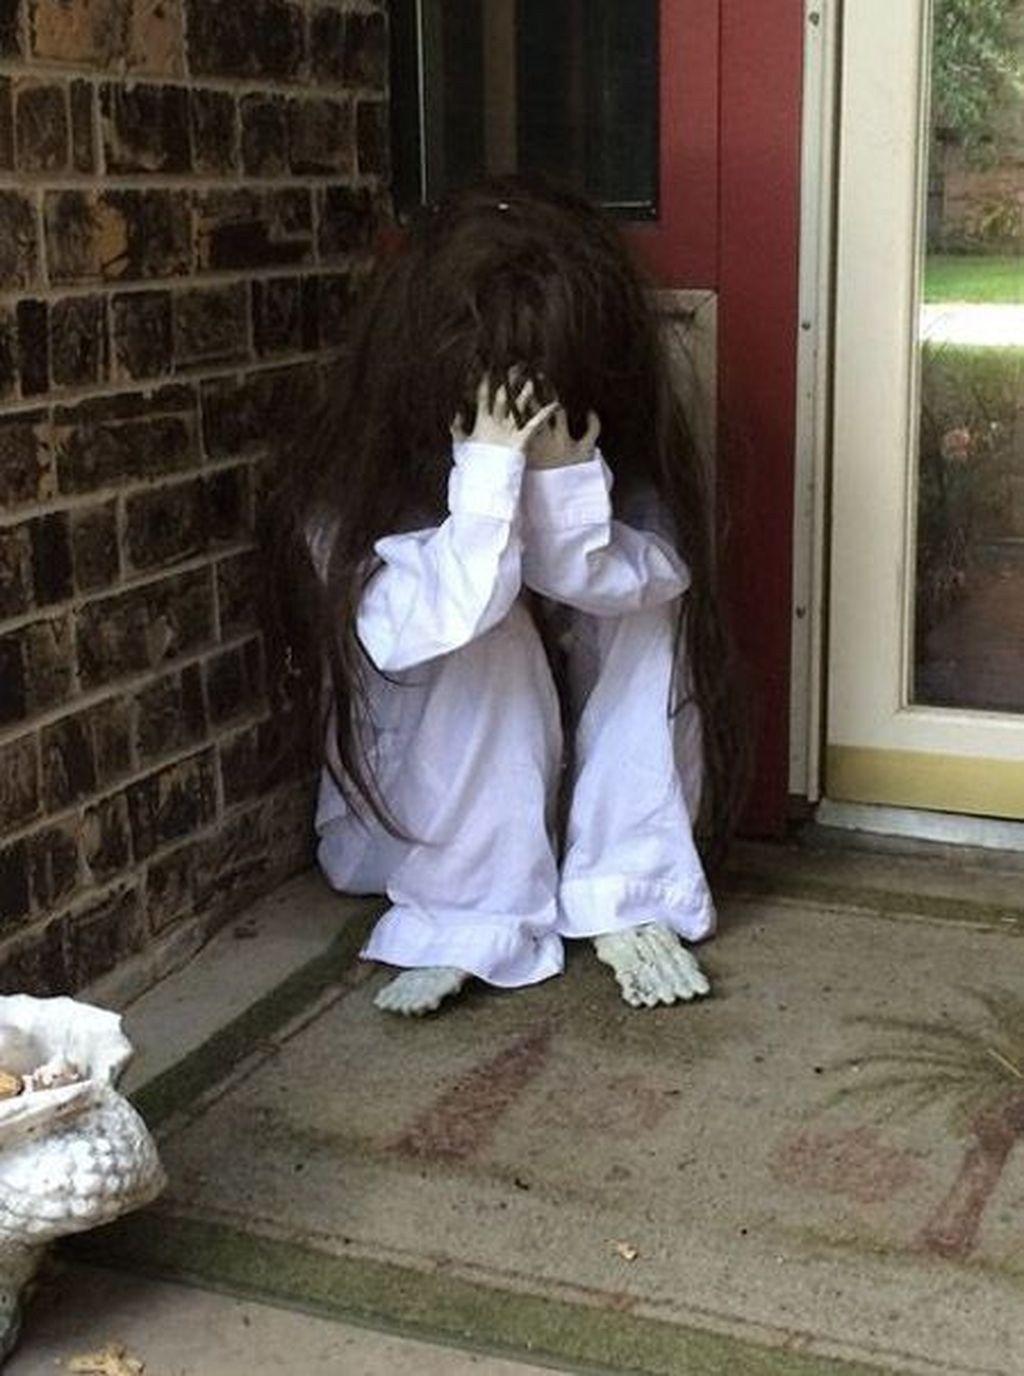 Pin by sarah day on Halloween Pinterest DIY Halloween, Halloween - diy halloween decorations scary